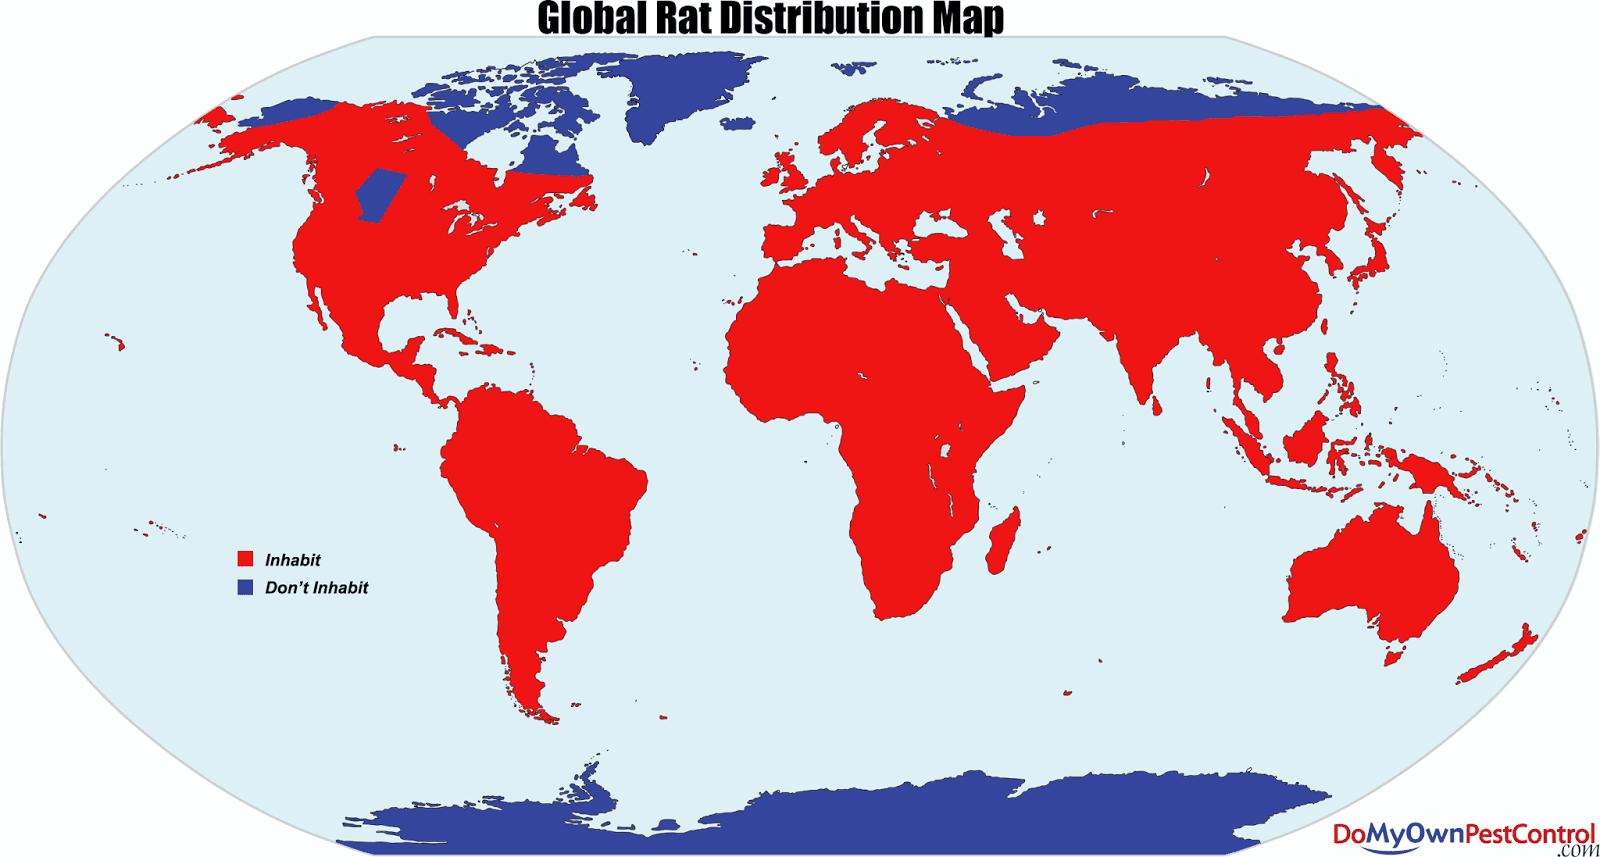 Global rat distribution map